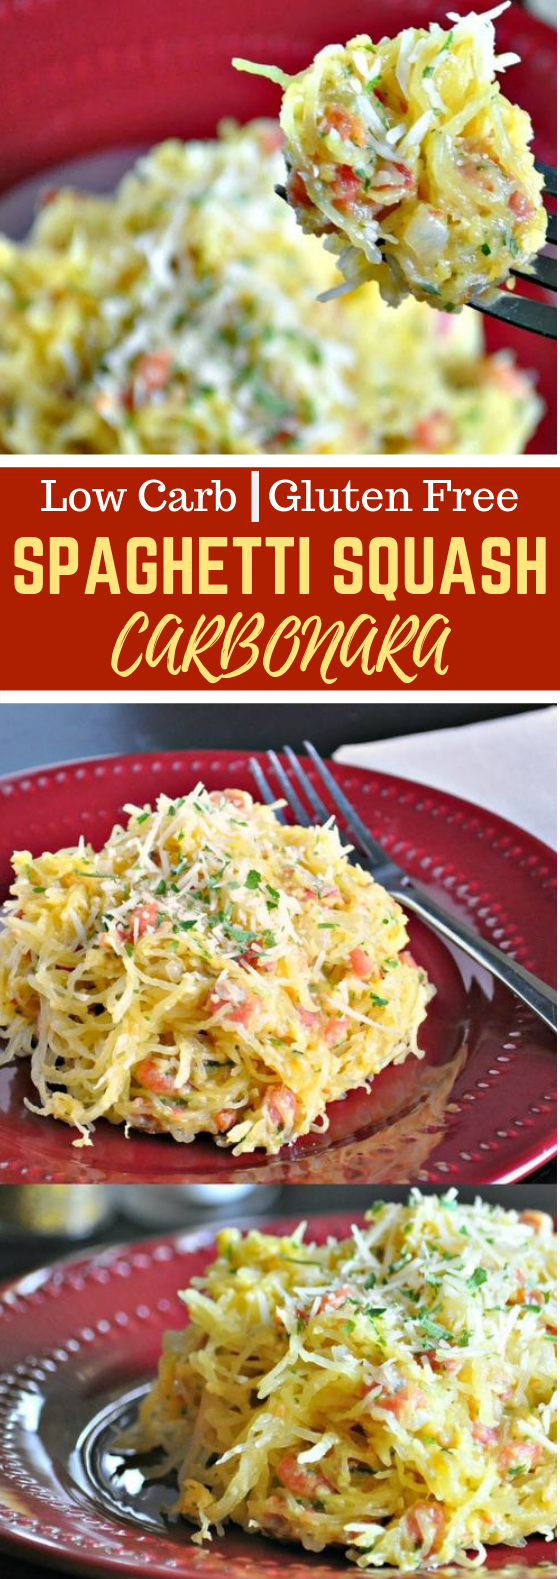 SPAGHETTI SQUASH CARBONARA – LOW CARB, GLUTEN FREE #lowcarb #parmesan